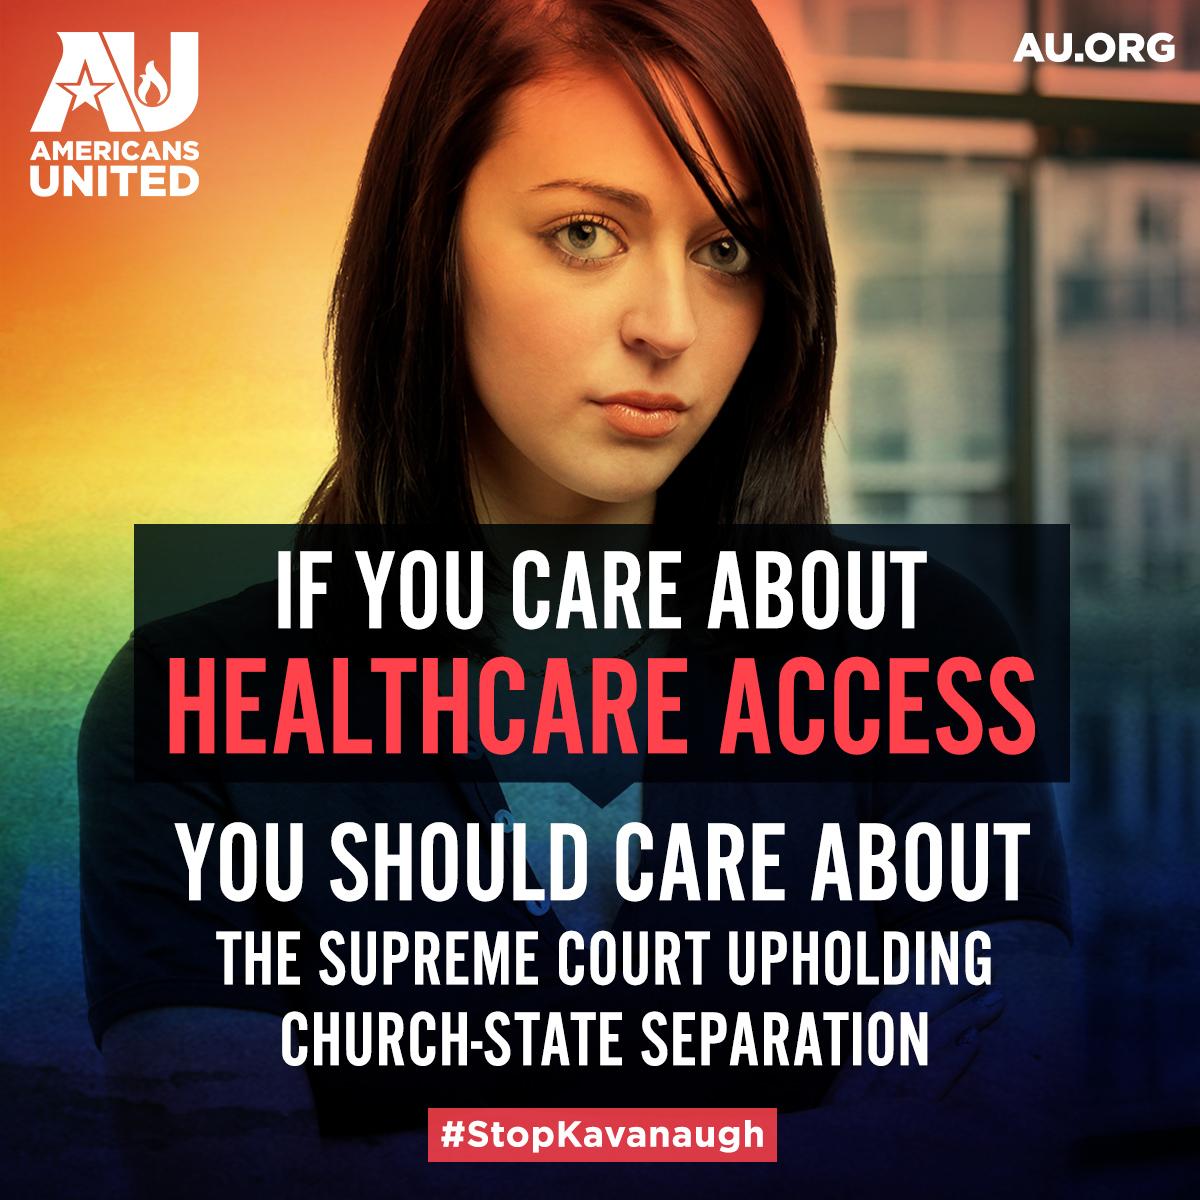 scotus_kavanaugh_healthcare-square.jpg